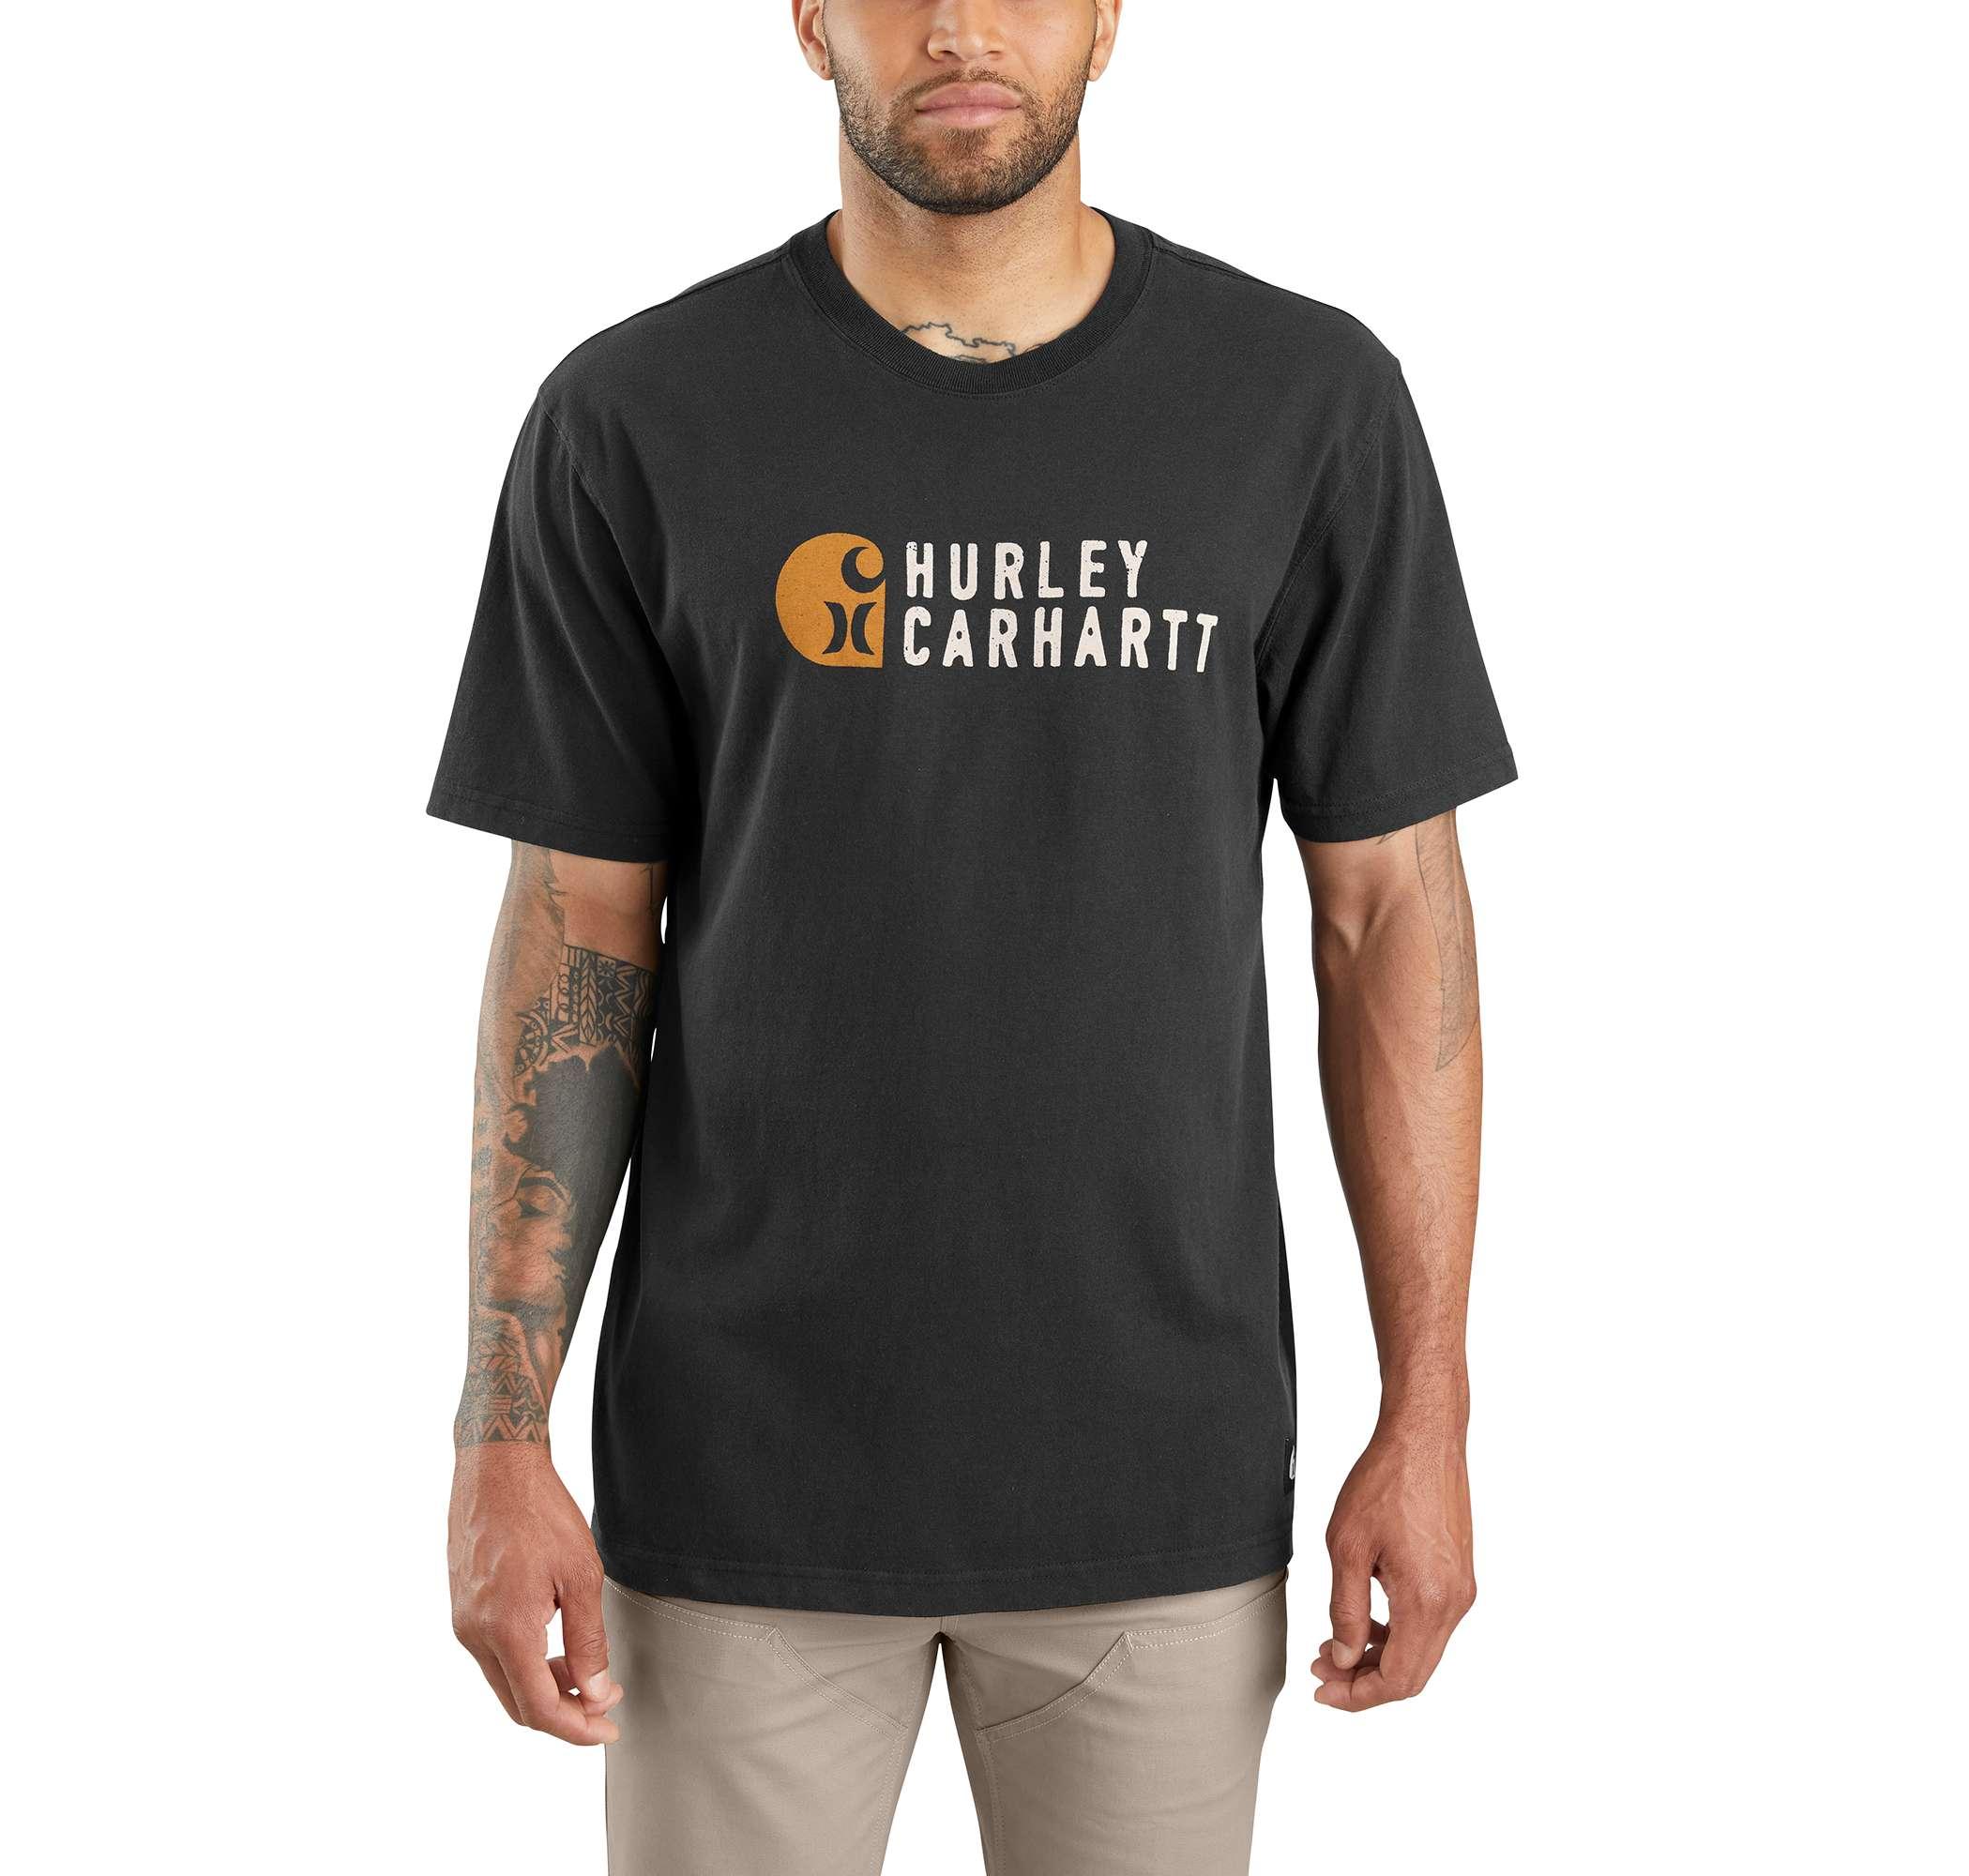 Carhartt Hurley x Carhartt men's graphic t-shirt